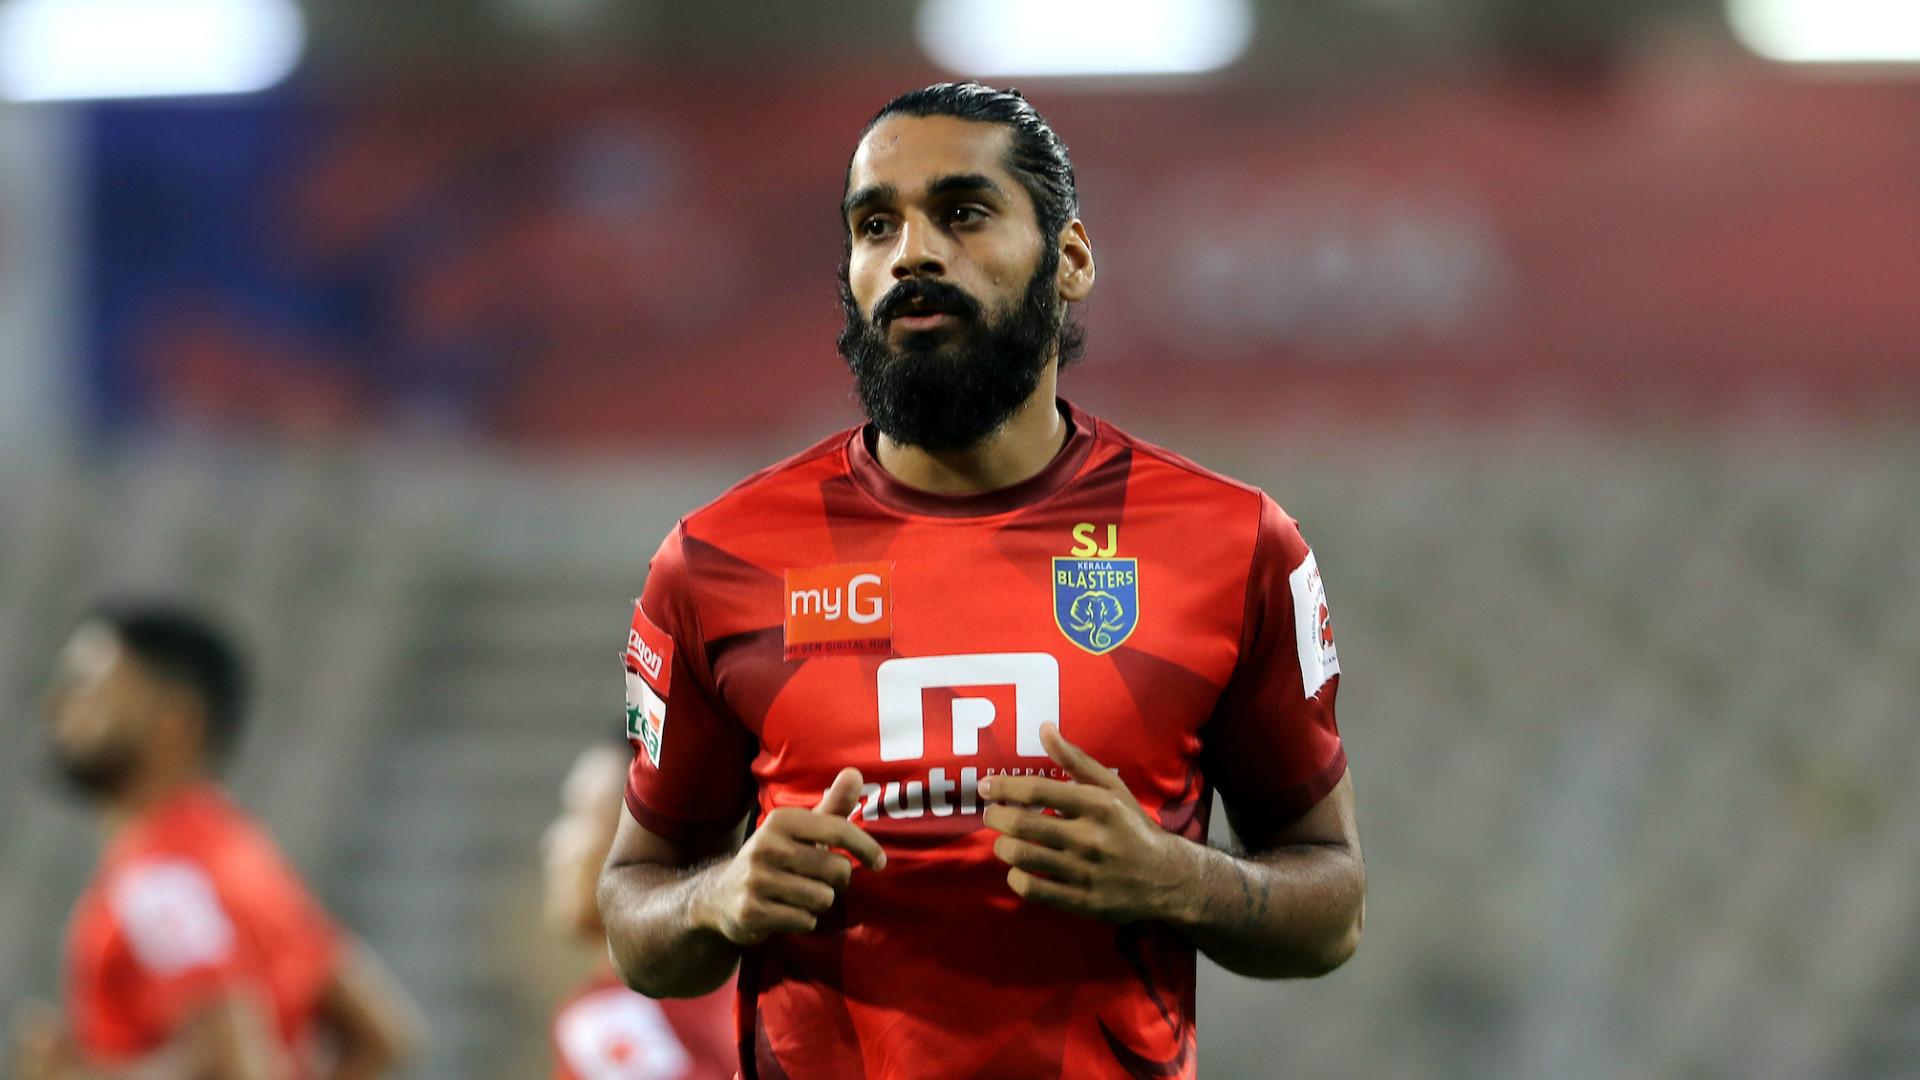 ISL: Kerala Blasters' Sandesh Jhingan likely to miss the season due to injury